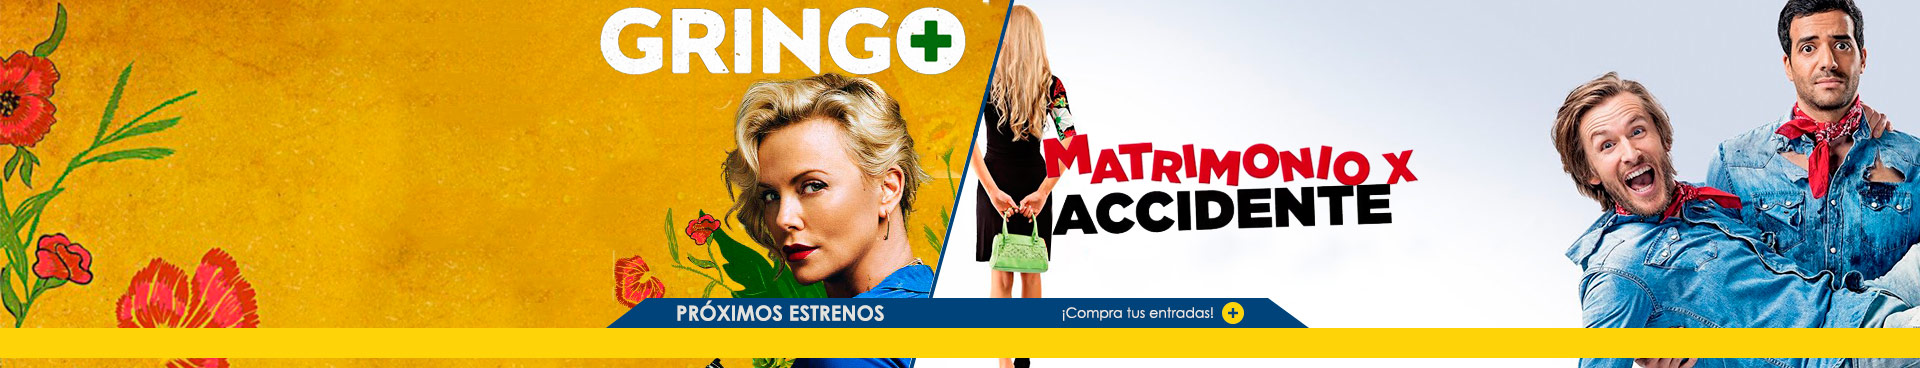 Proximamente Gringo + Matrimonio por accidente